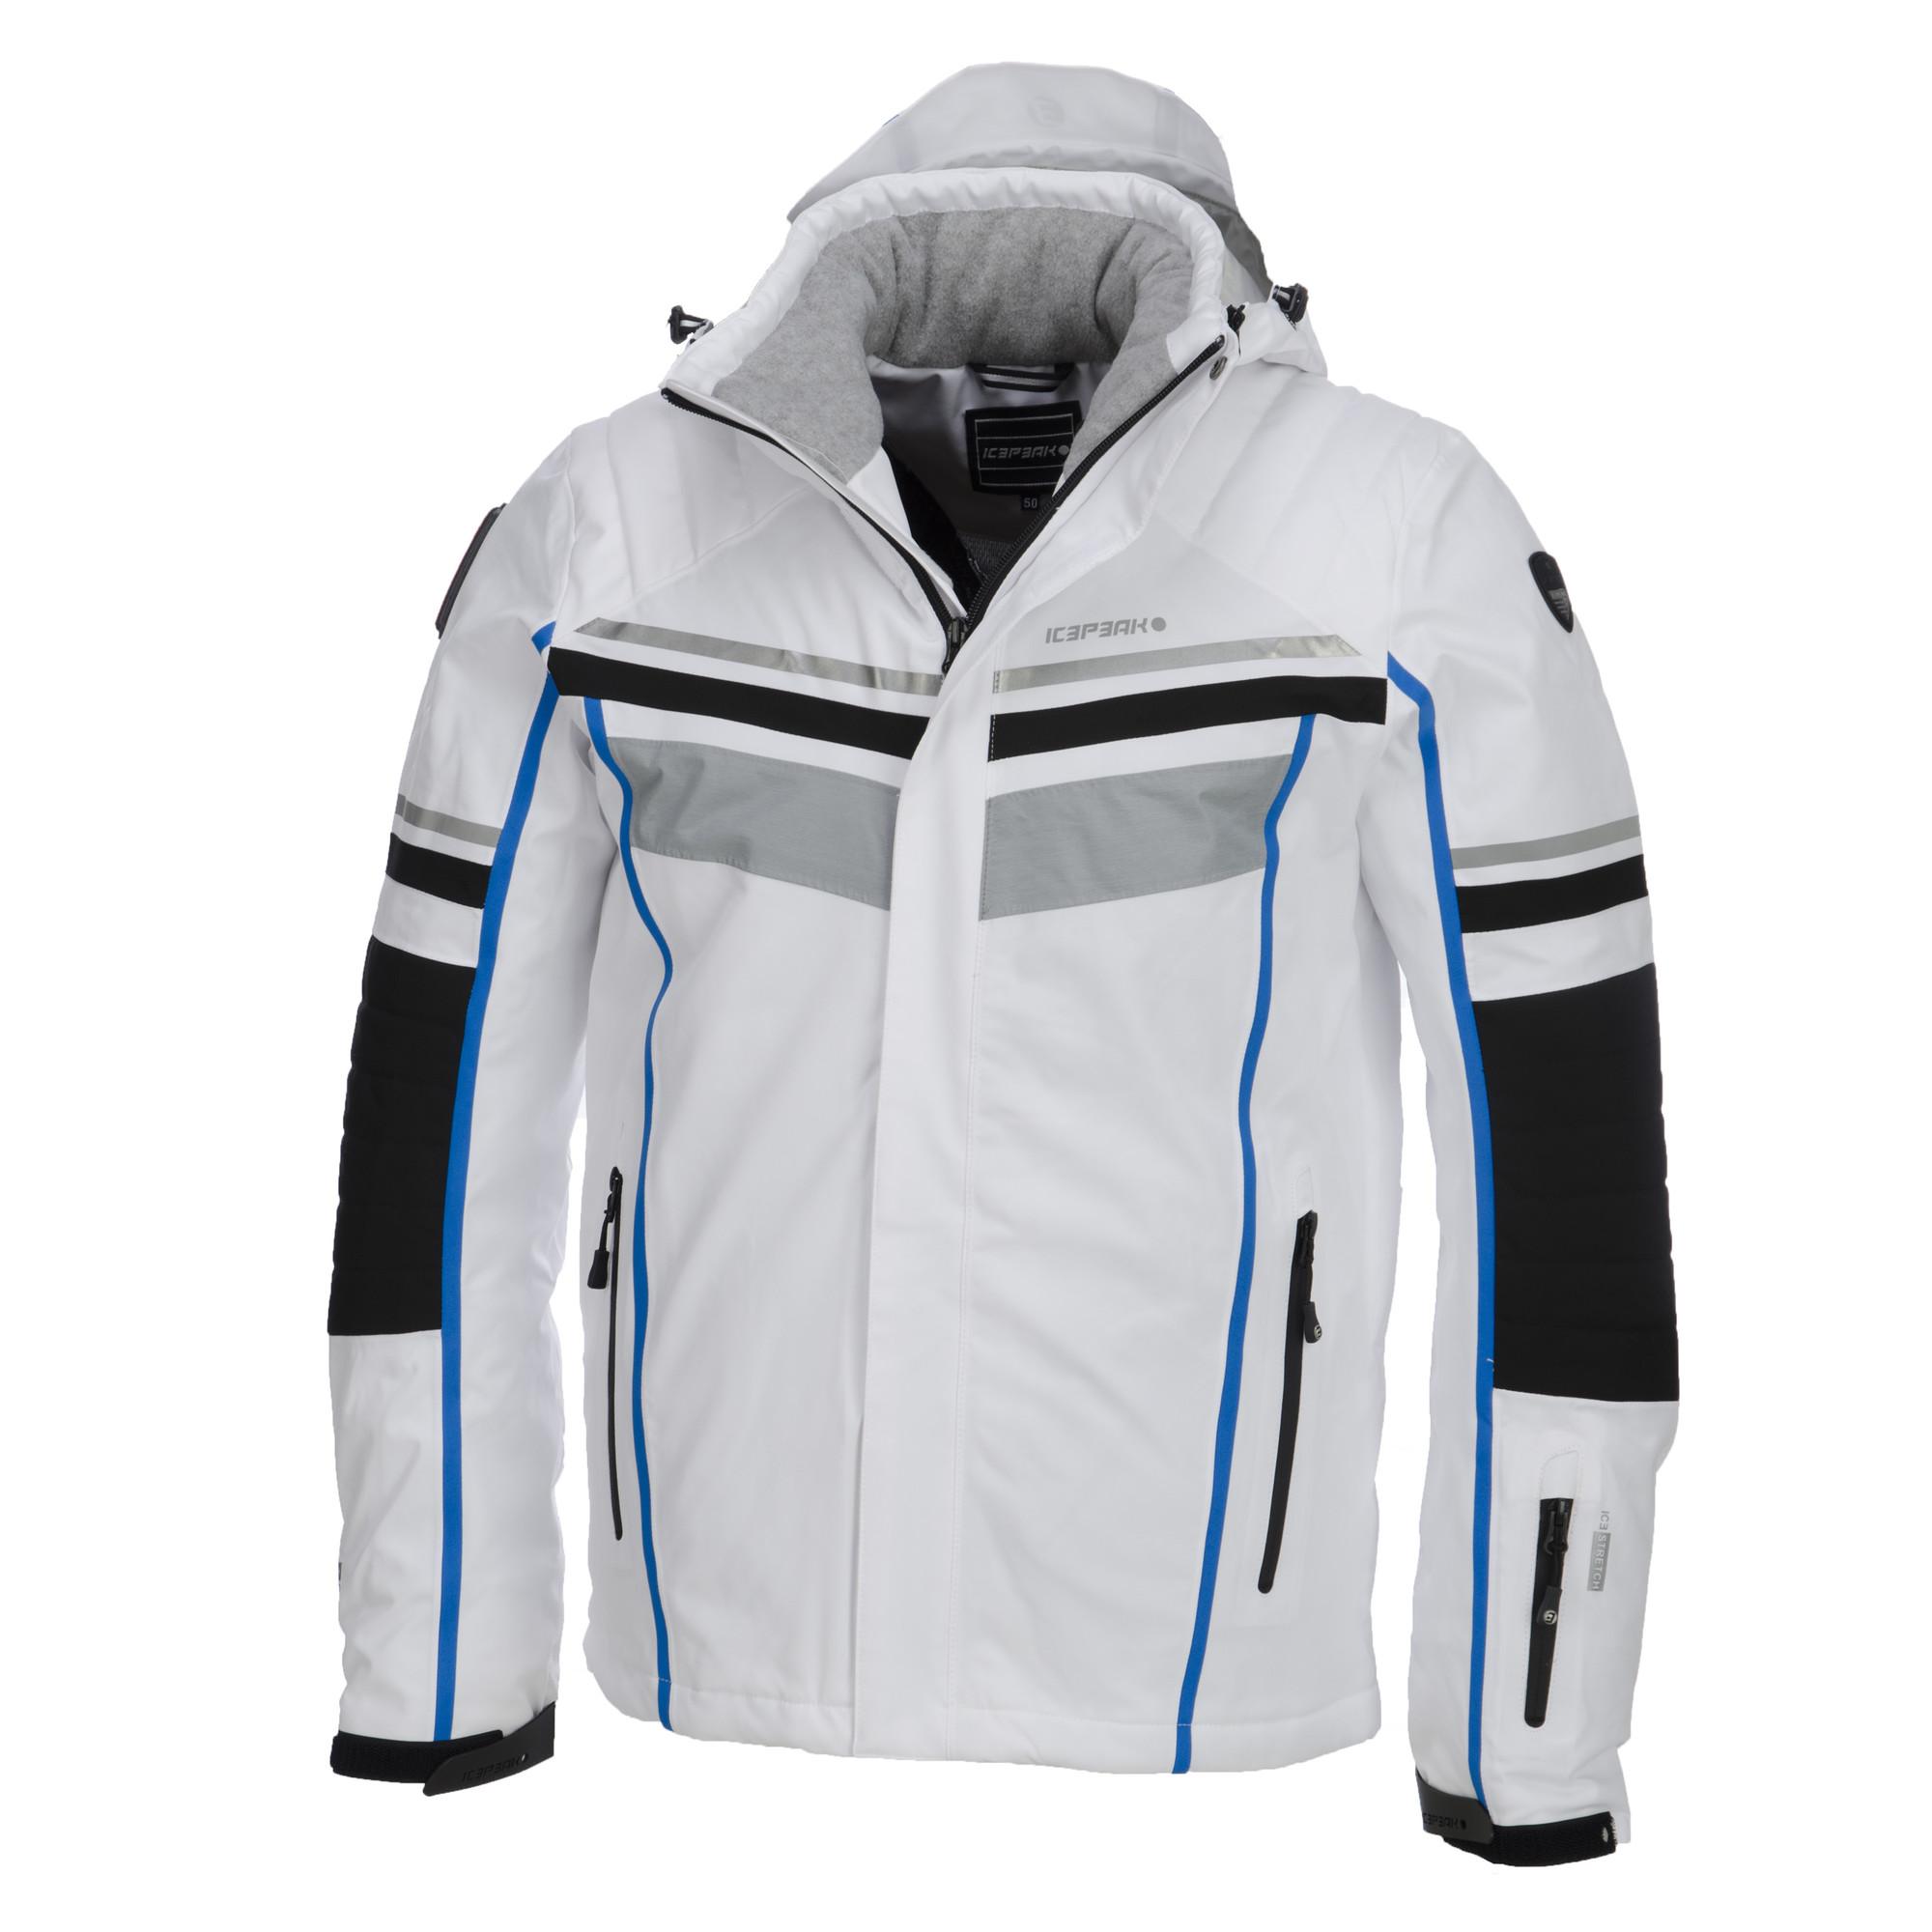 Icepeak, Nevin, Skijacket, Men, White Black Blue